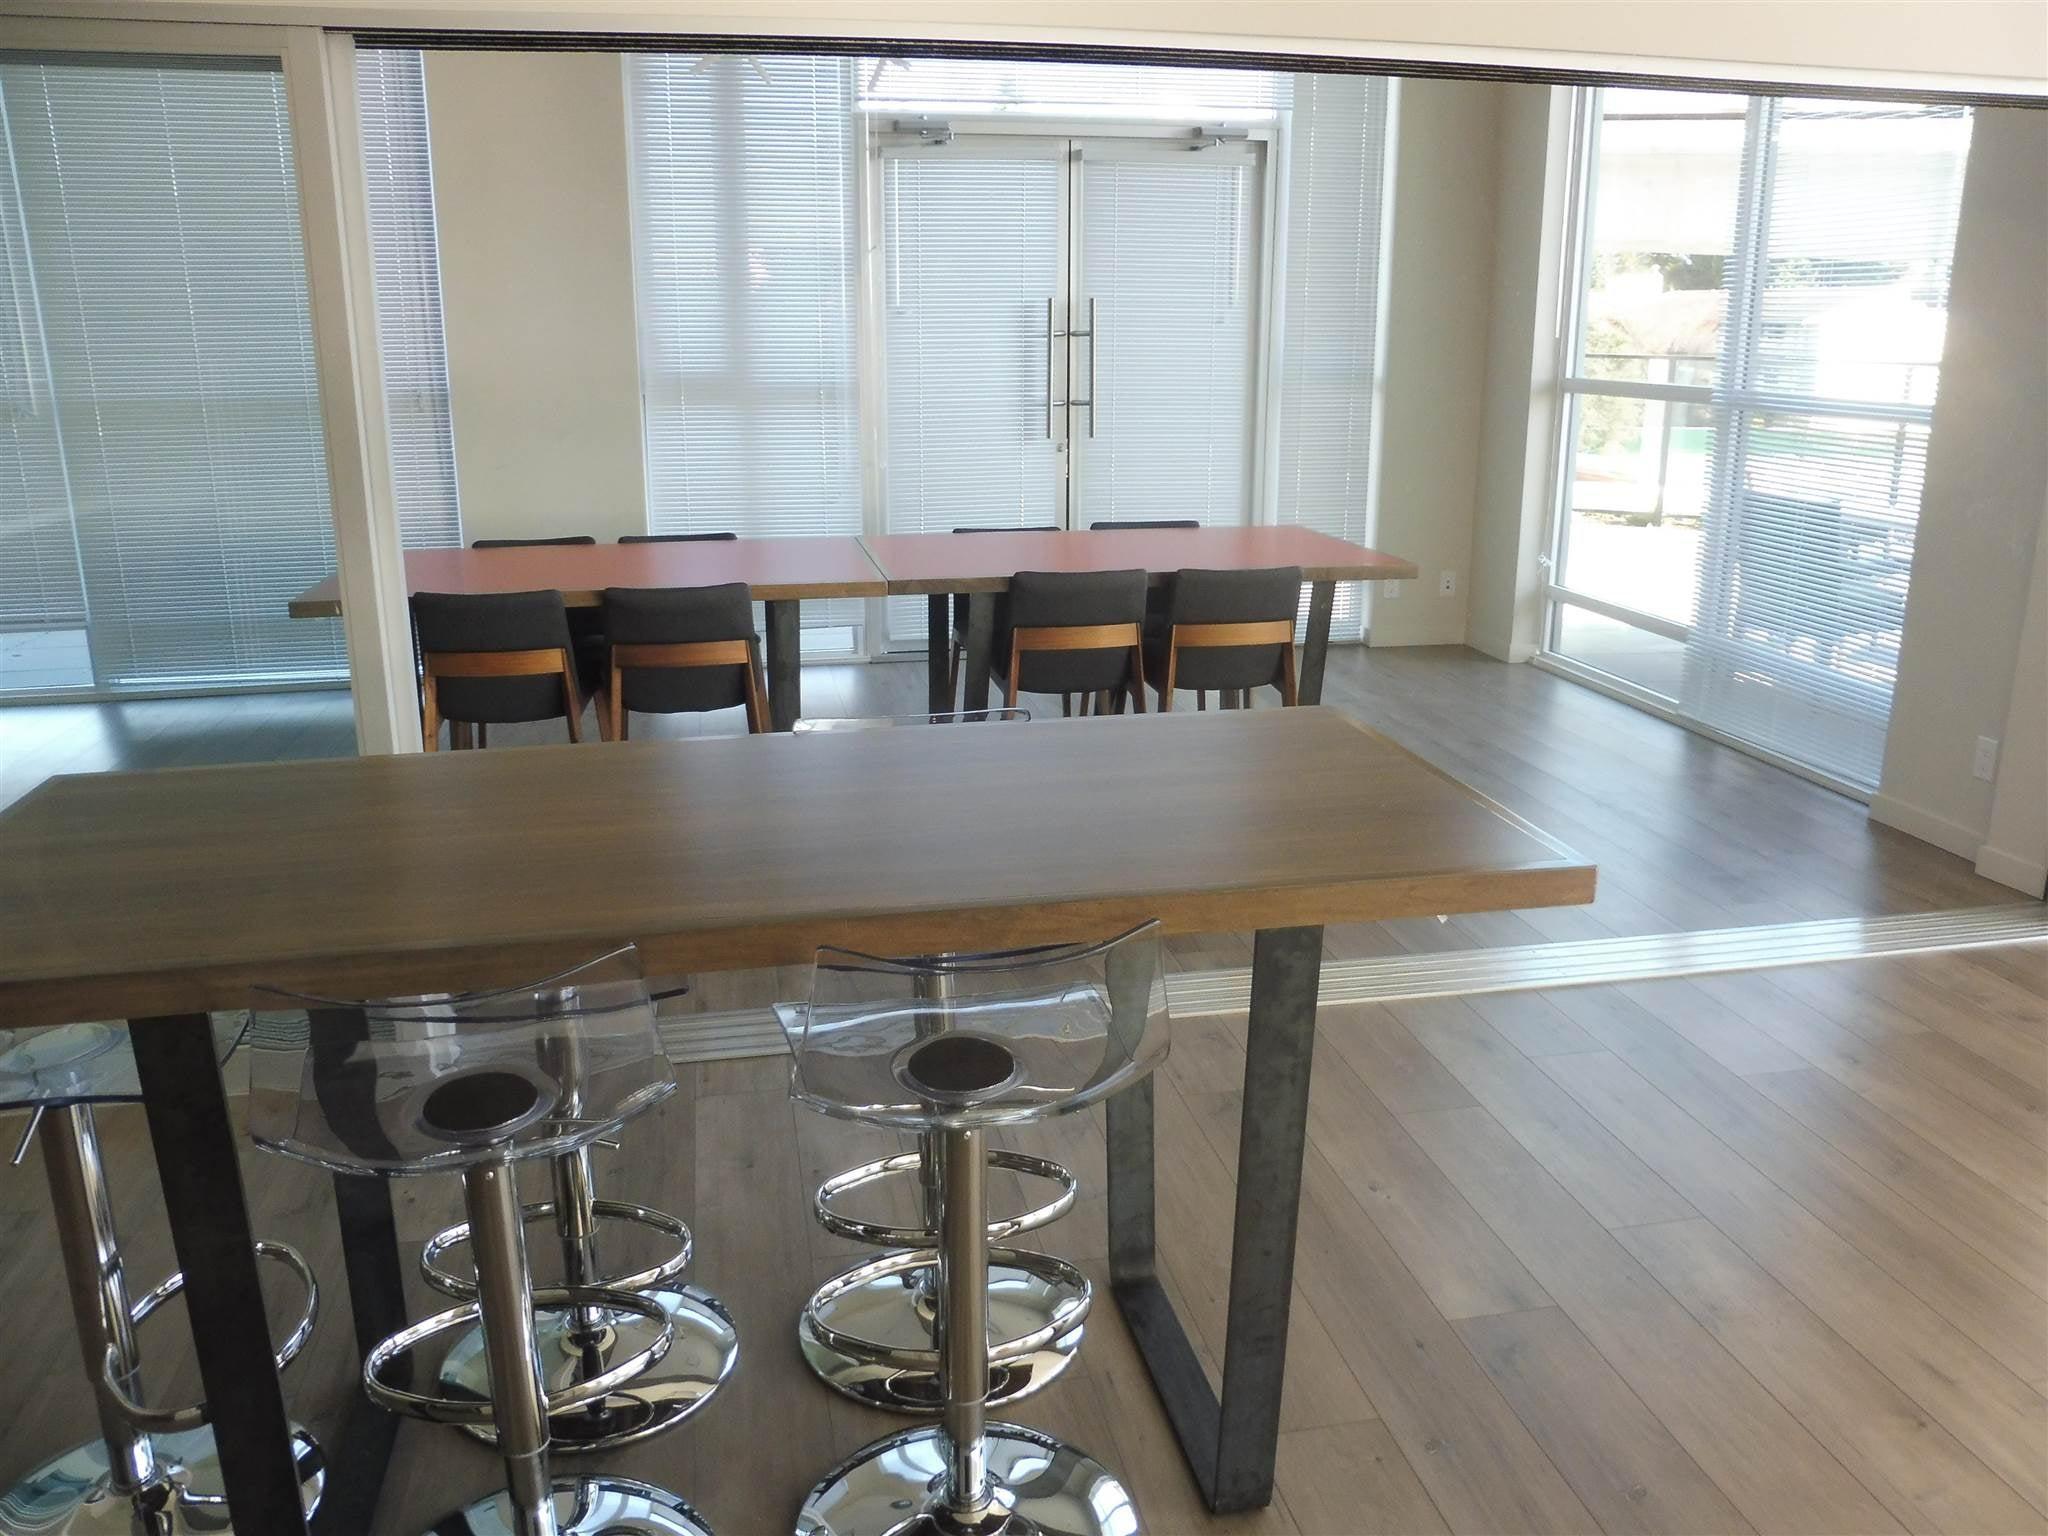 1409 691 NORTH ROAD - Coquitlam West Apartment/Condo for sale, 2 Bedrooms (R2604155) - #23